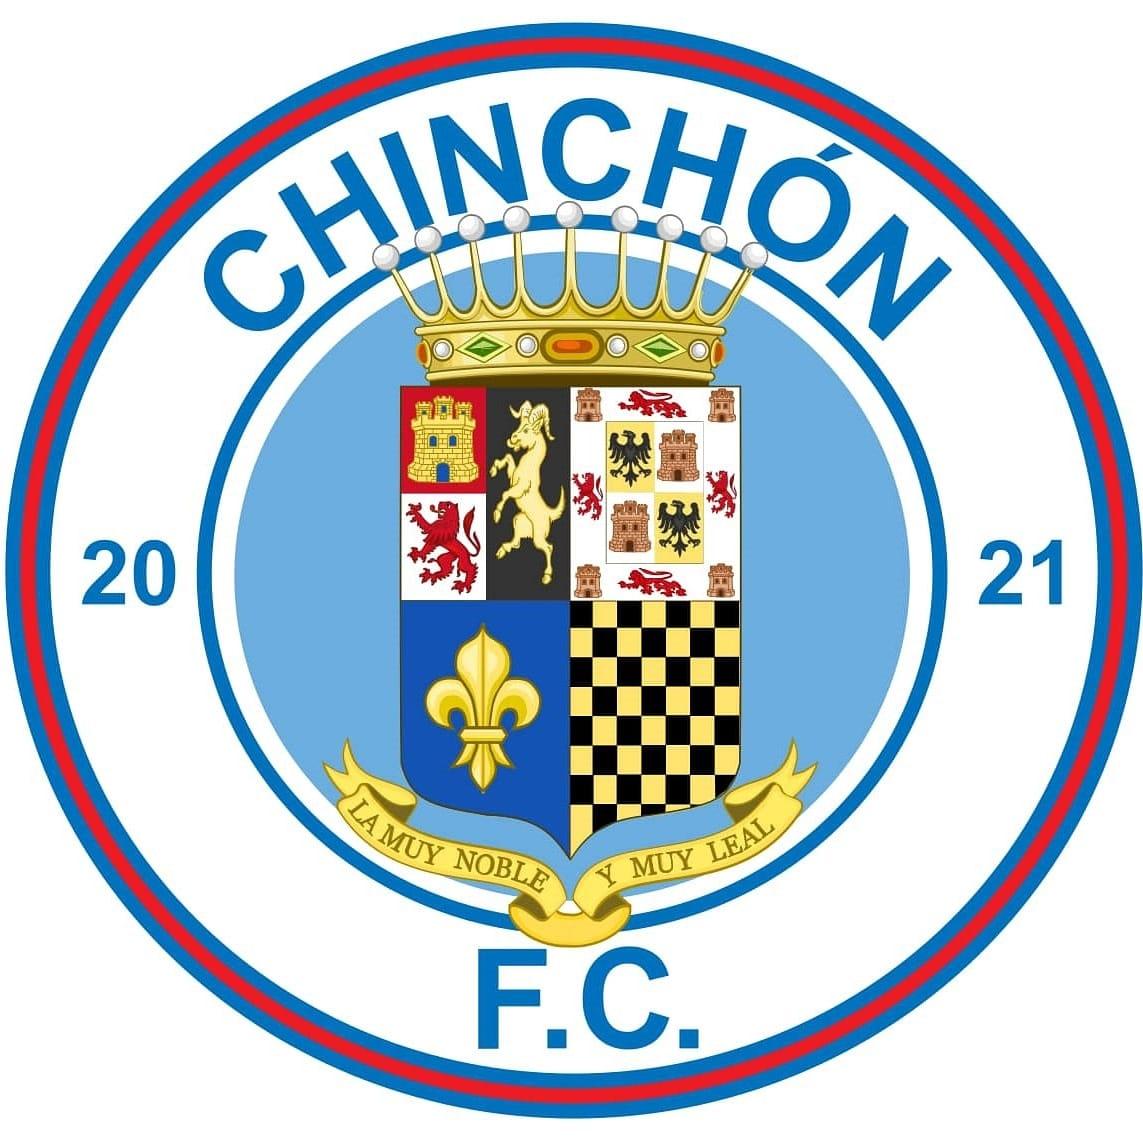 CHINCHON F.C